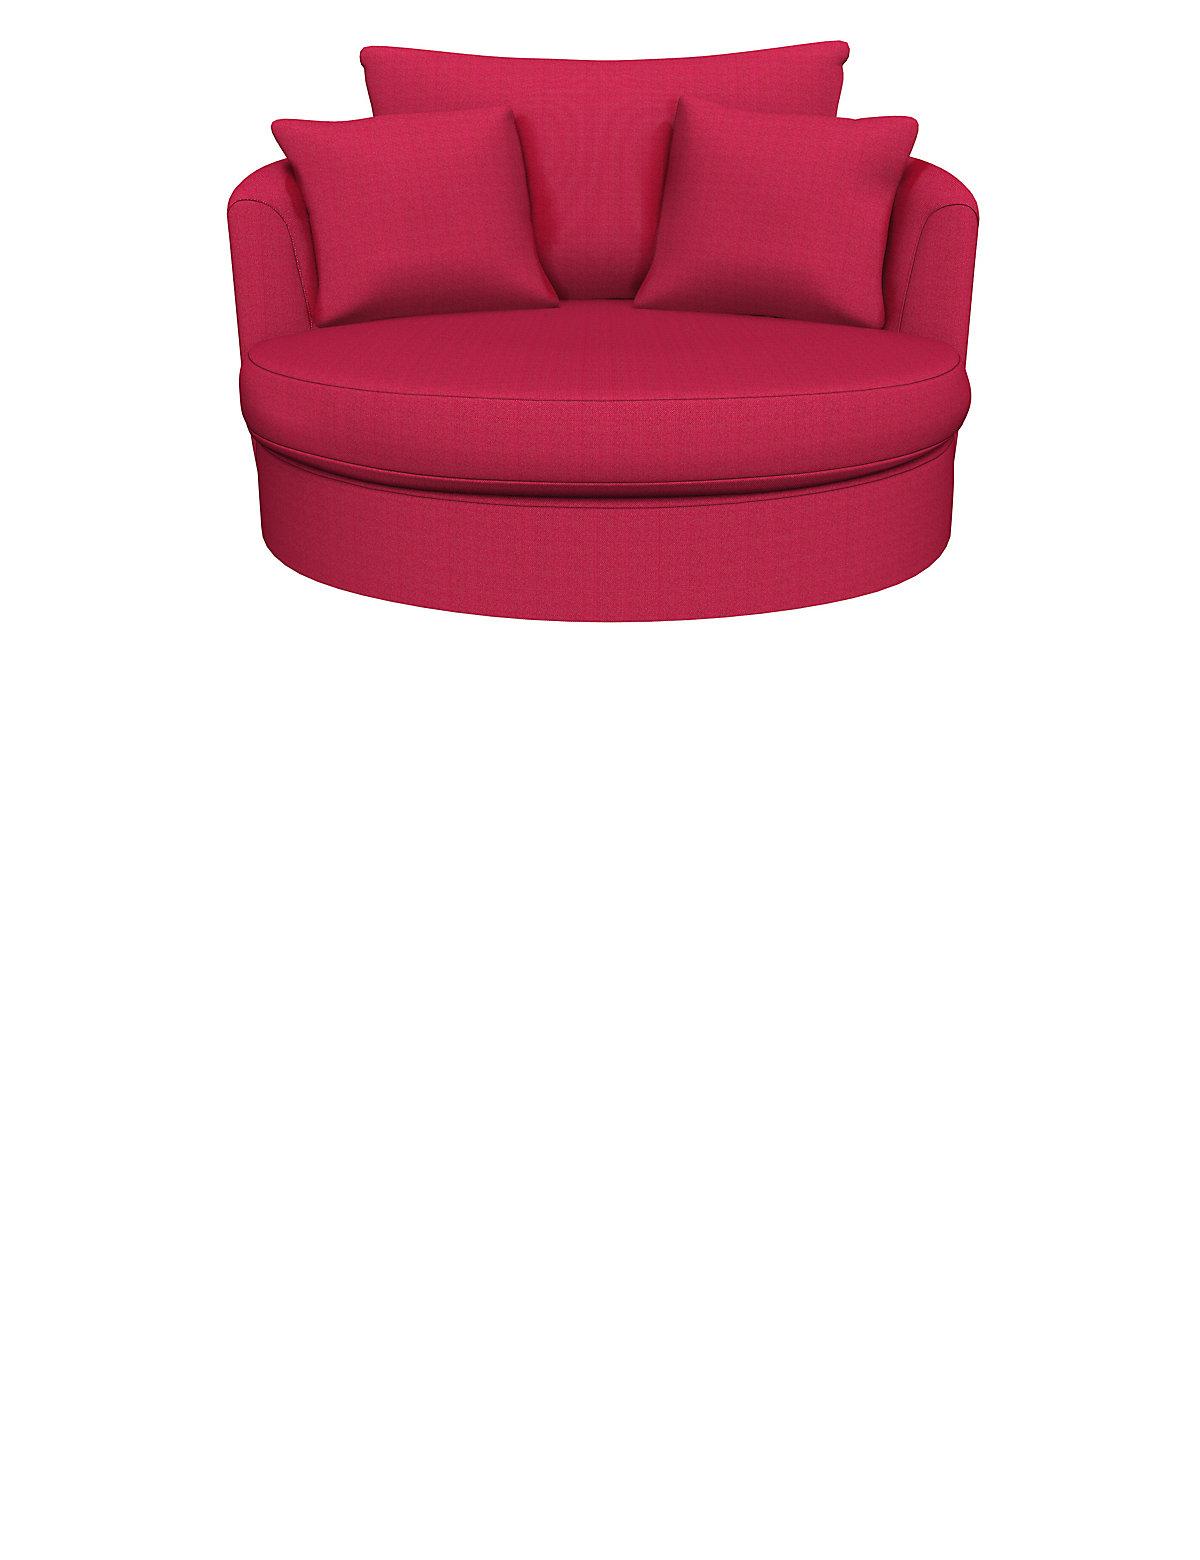 Buy Red Swivel Loveseat Snuggler In Faux Leather